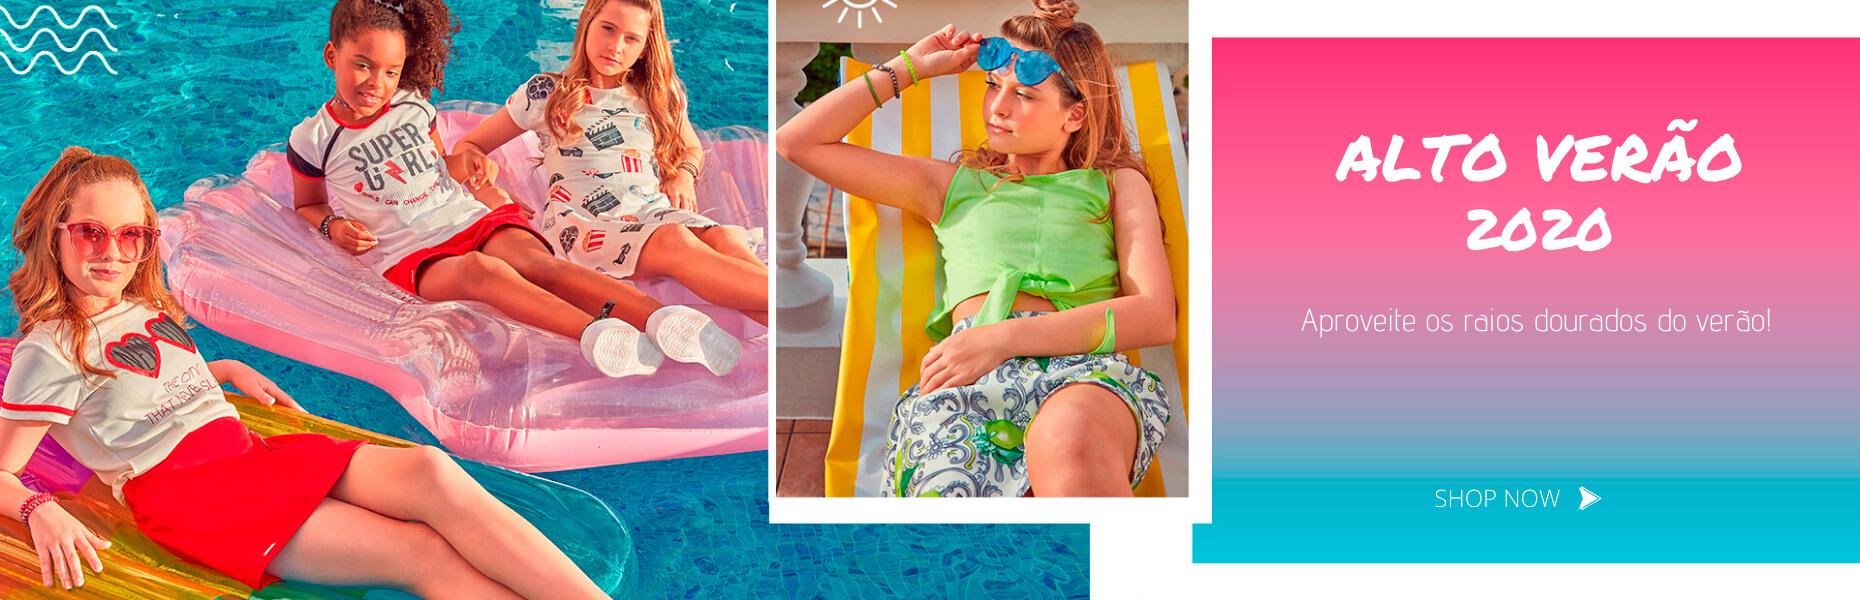 Conjuntos infantis feminino loja online